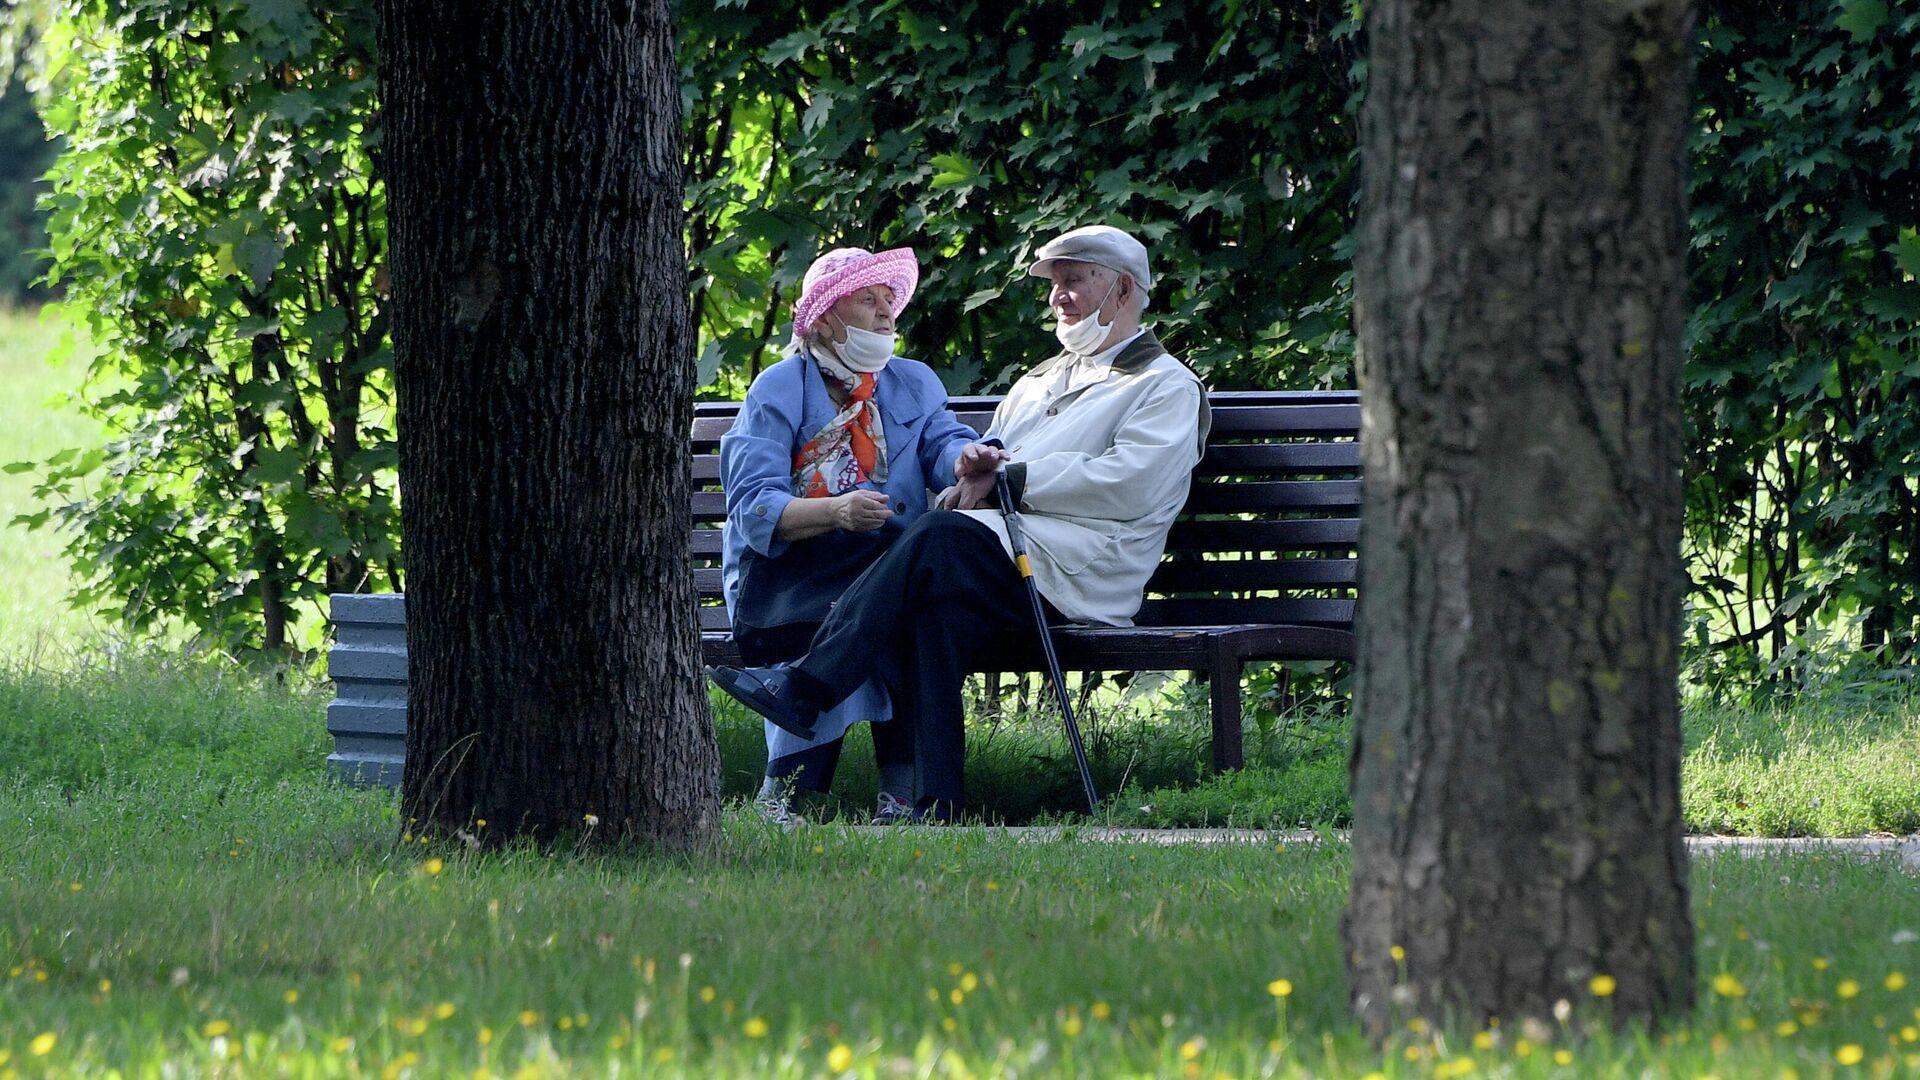 Пенсионеры в парке - Sputnik Беларусь, 1920, 06.10.2021